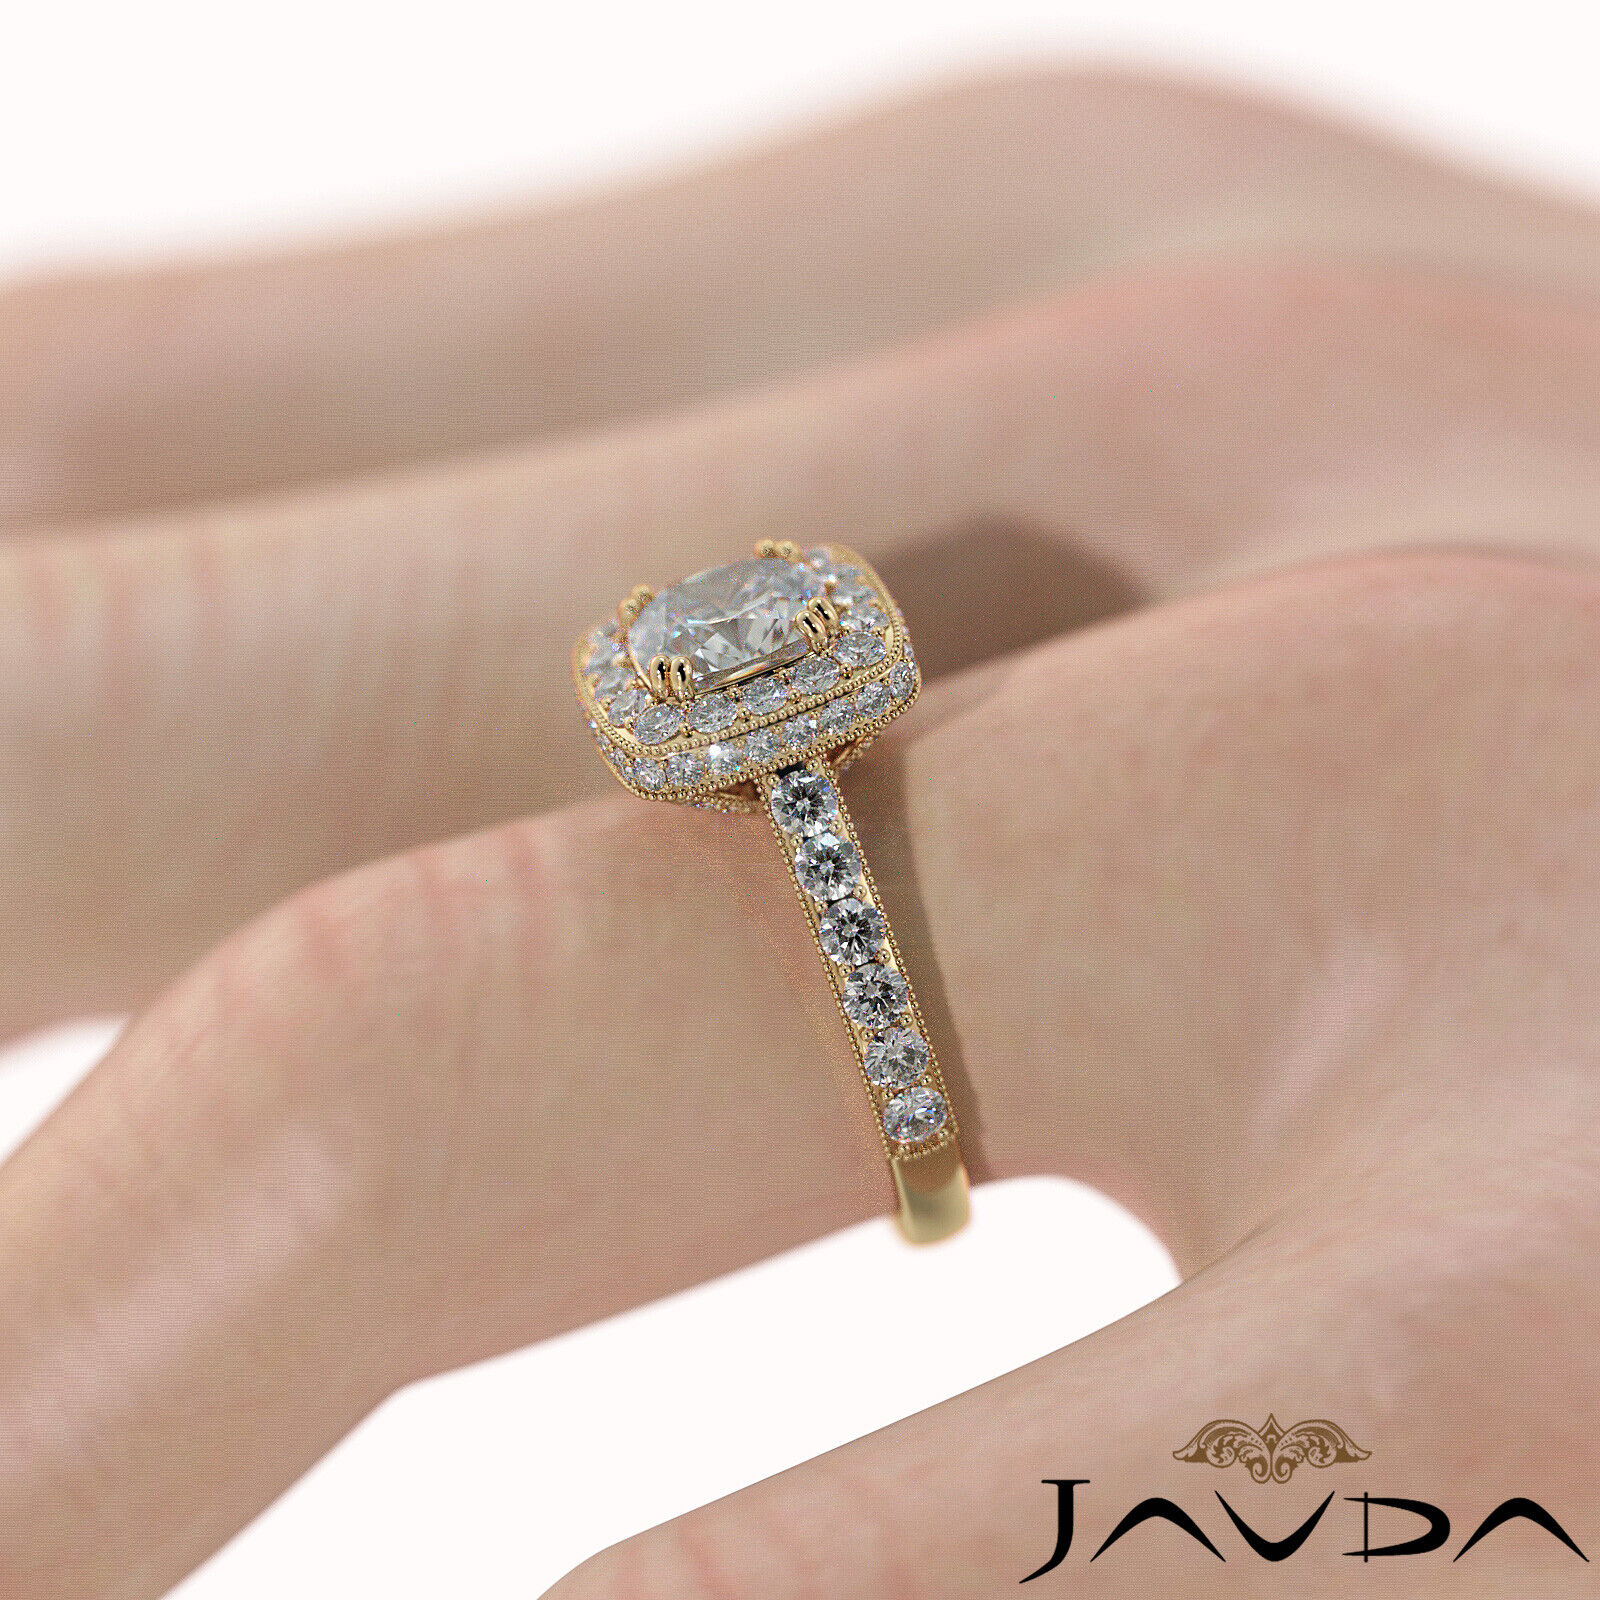 2.12ctw Milgrain Floral Basket Cushion Diamond Engagement Ring GIA I-SI2 W Gold 11